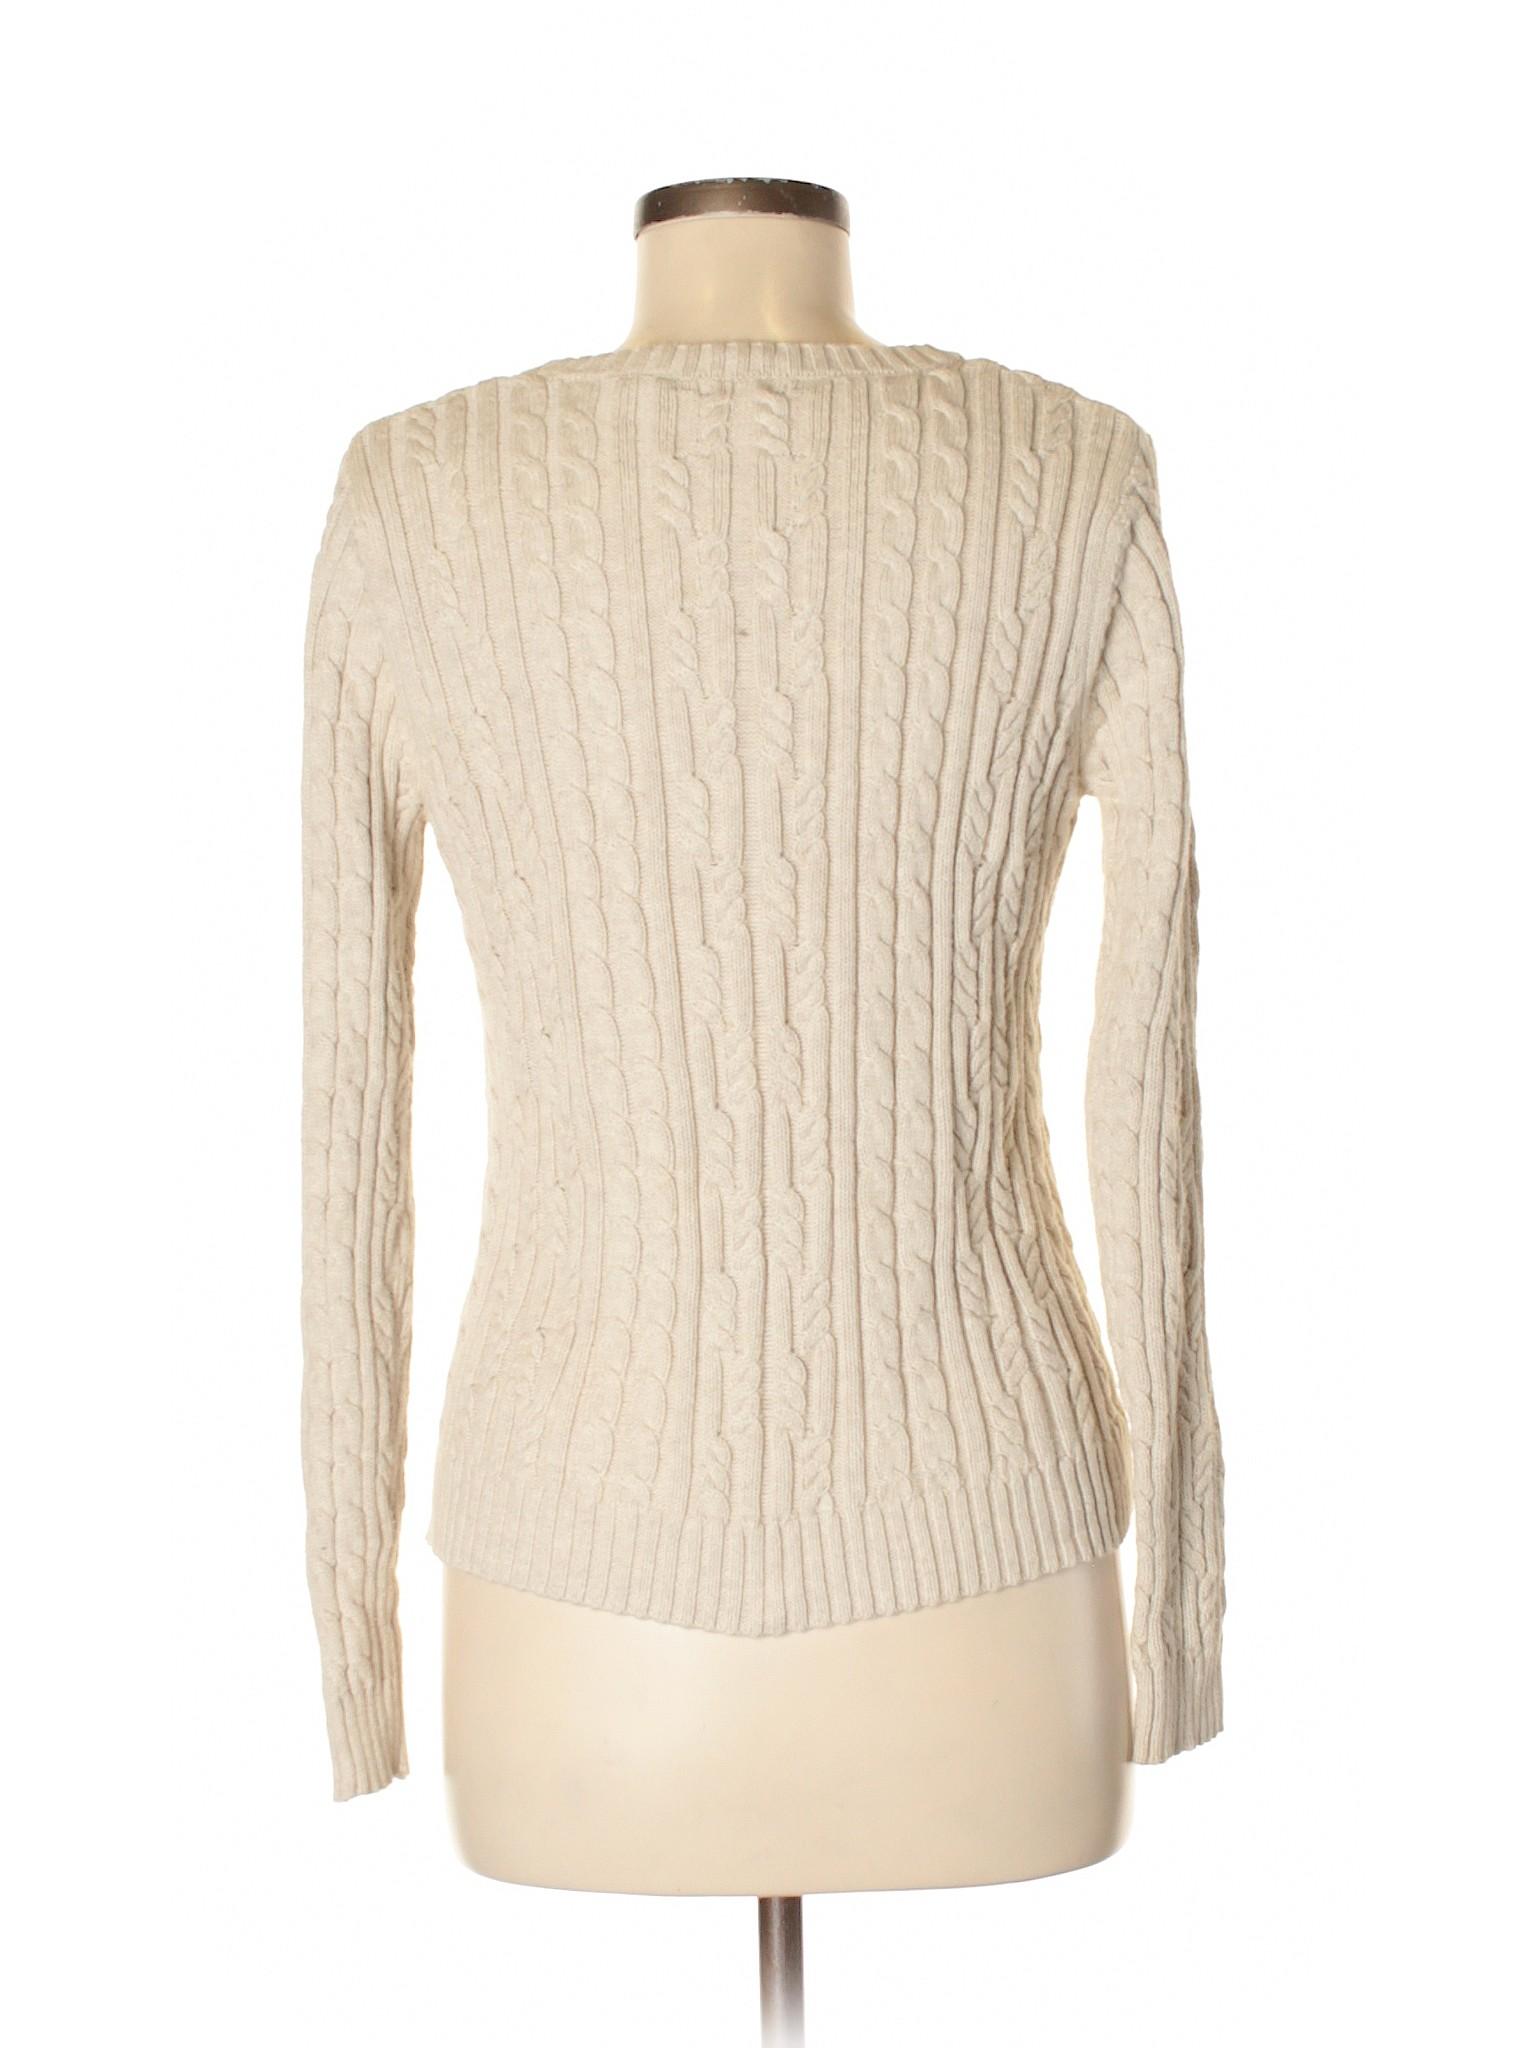 Boutique Valerie Sweater Stevens Valerie Pullover Boutique vSHqwS6g